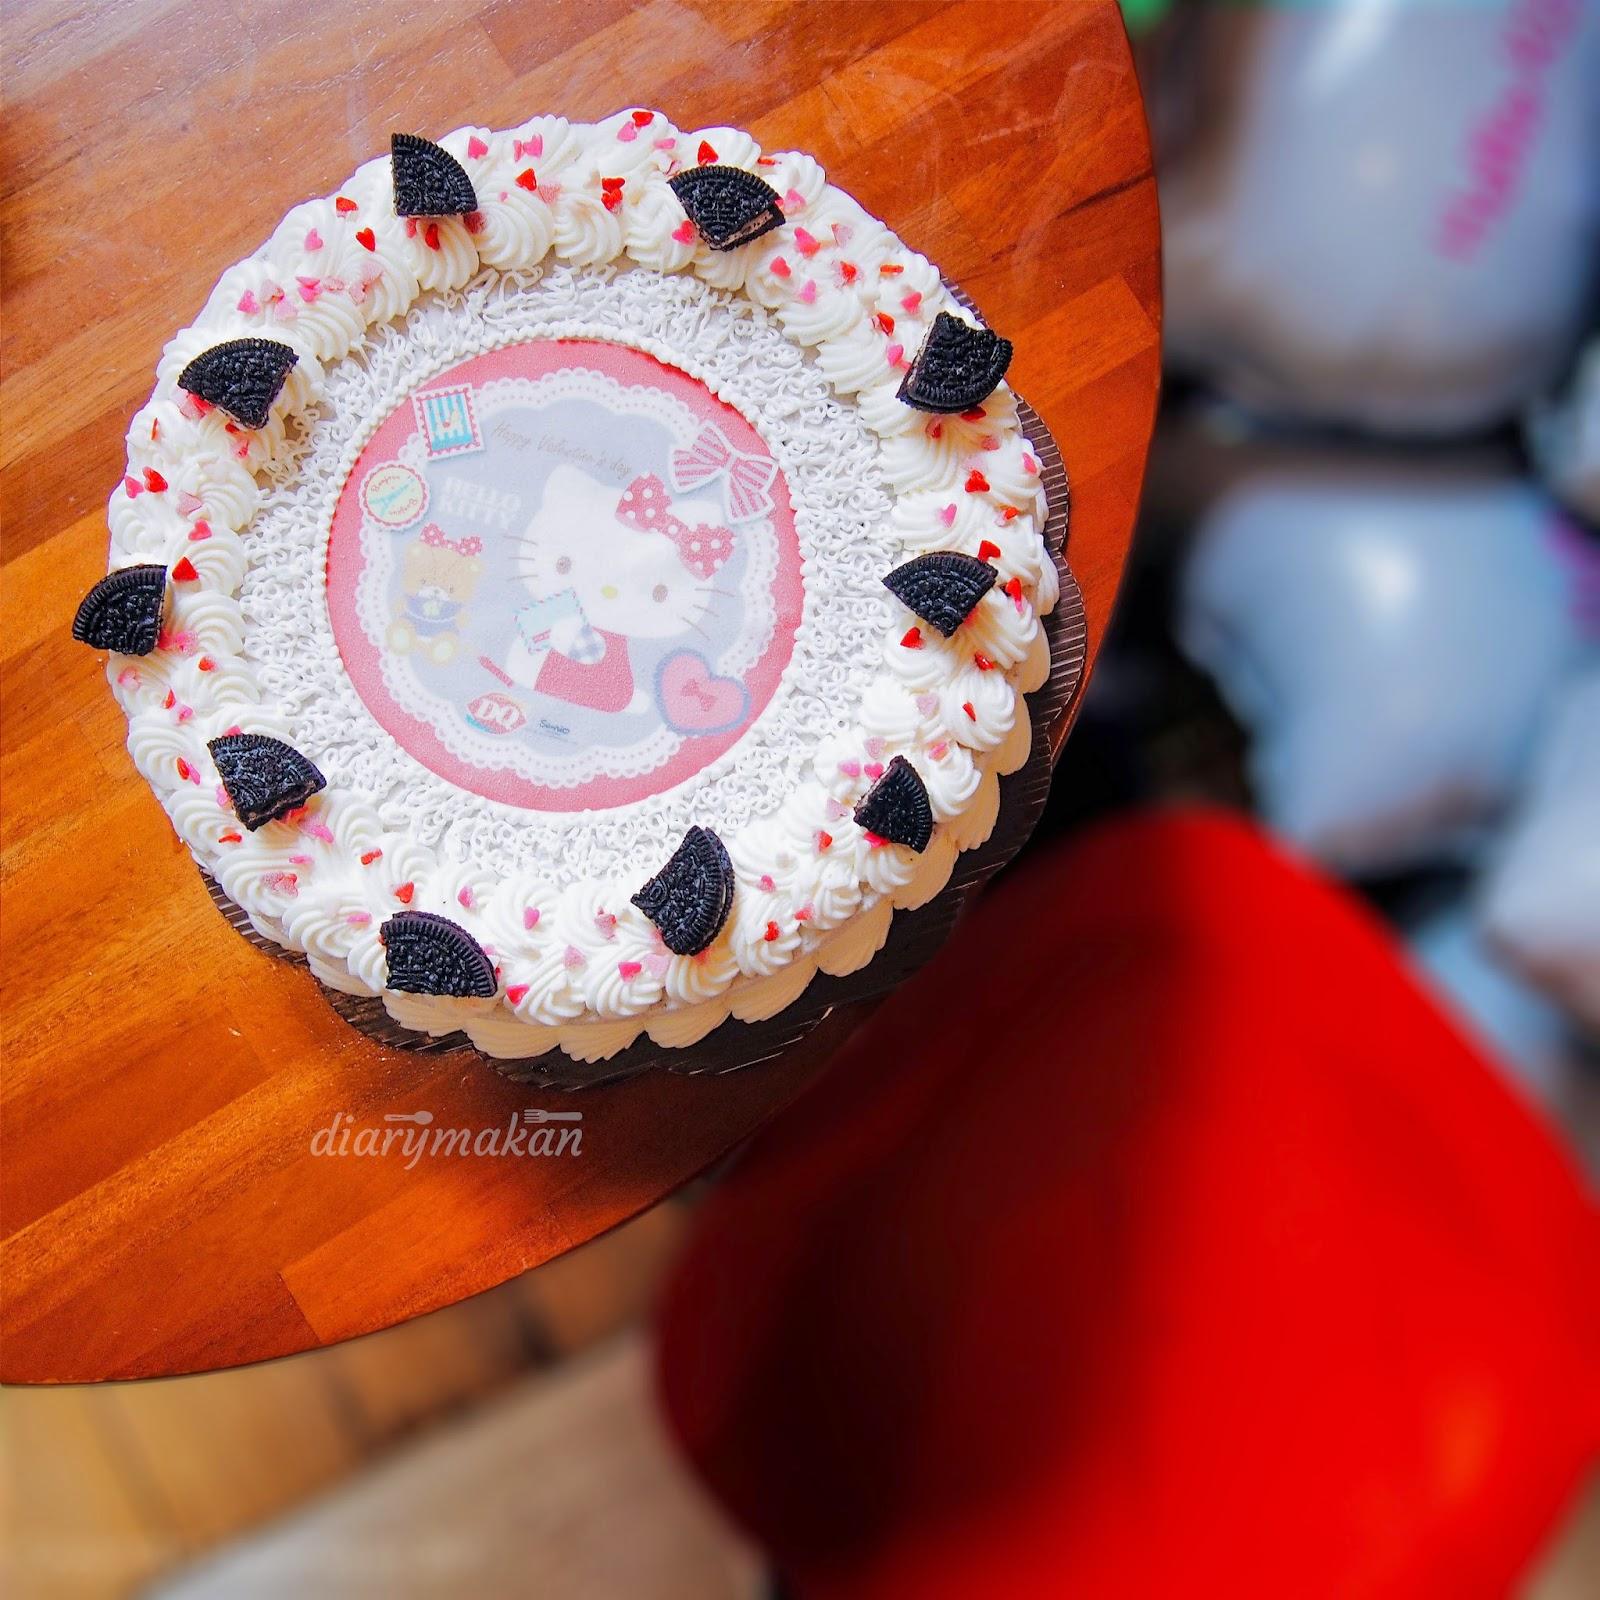 Dairy Queen Ice Cream Cake Hello Kitty